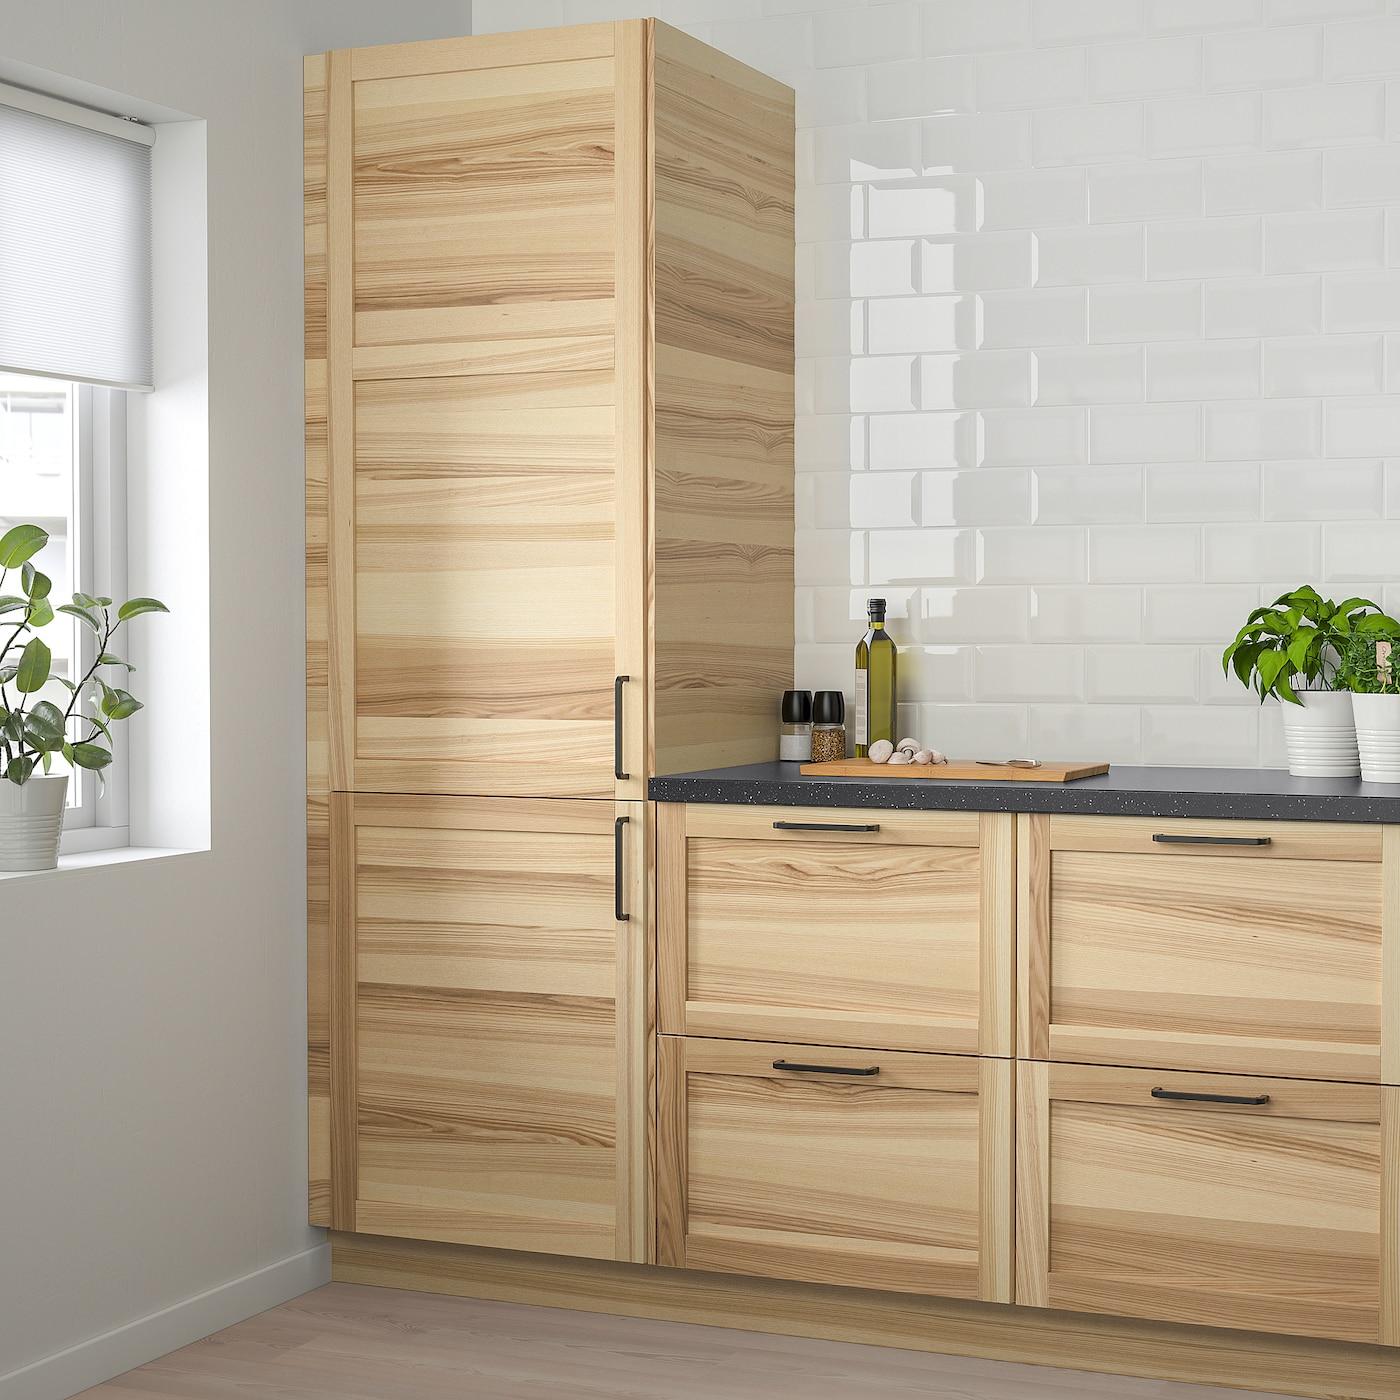 Torhamn Door Natural Ash 12x40 31x102 Cm Ikea